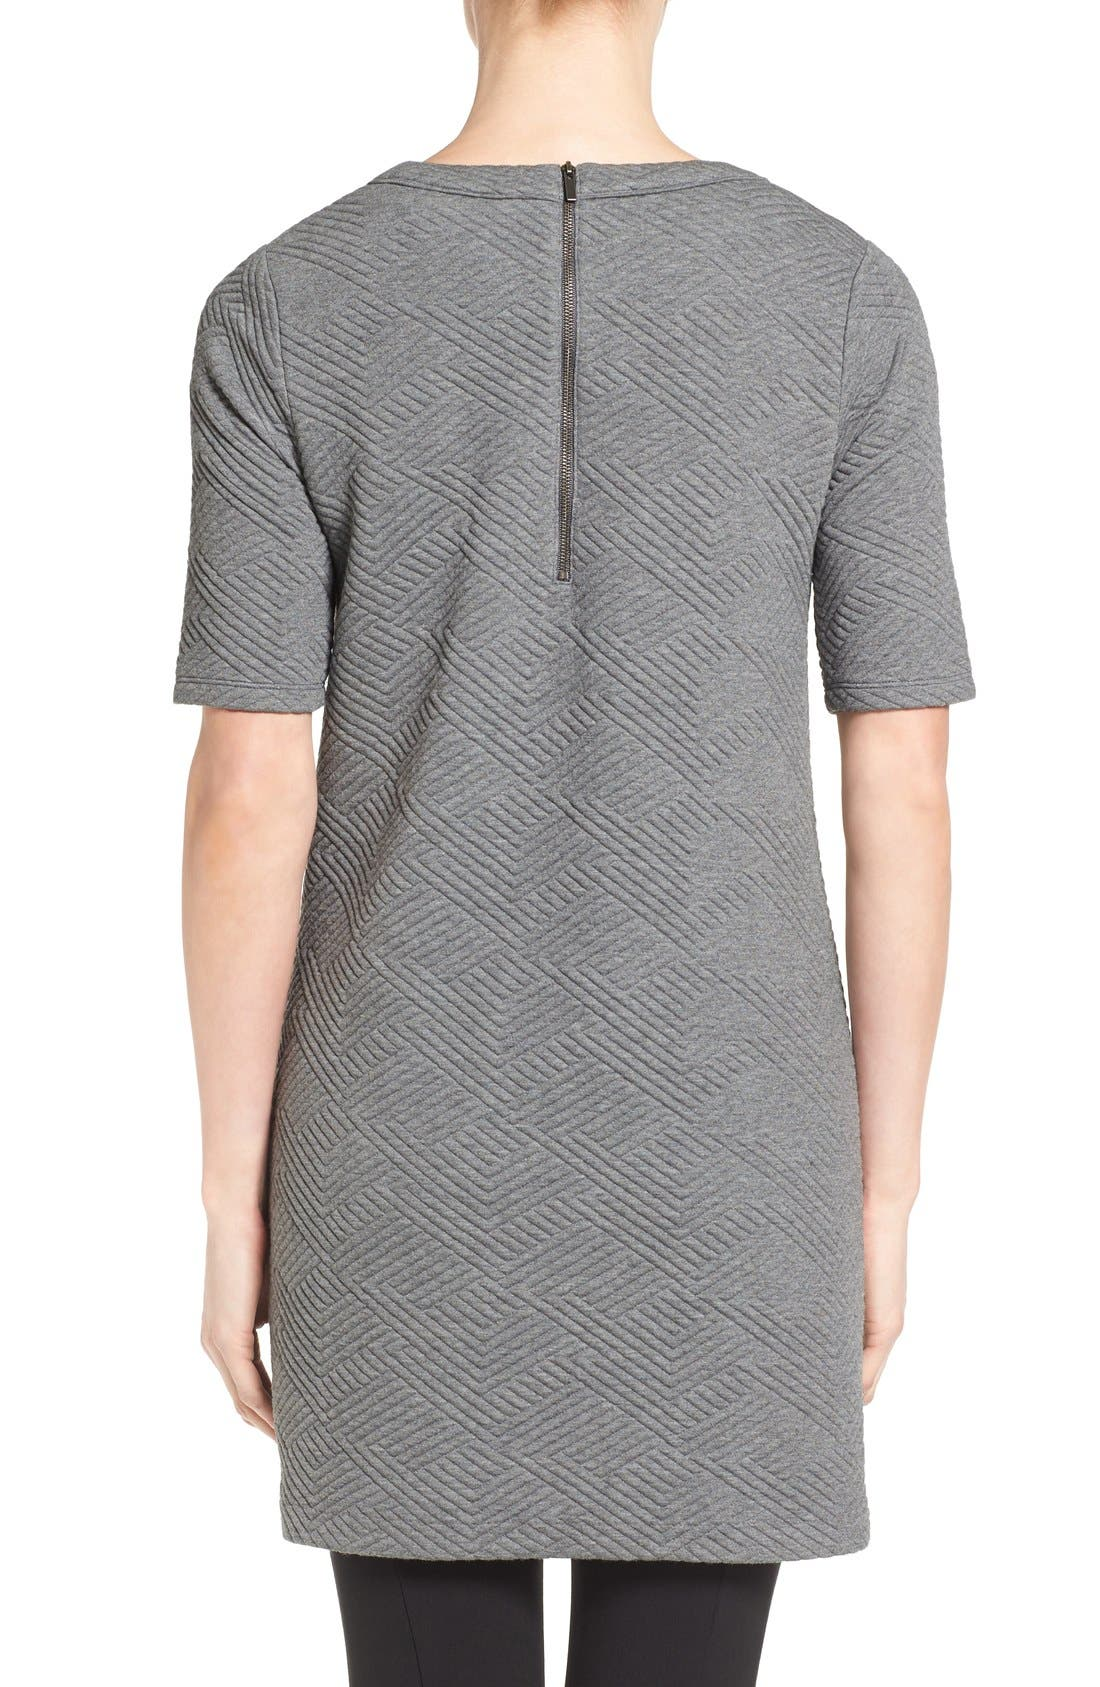 Textured Elbow Sleeve Tunic Dress,                             Alternate thumbnail 10, color,                             030